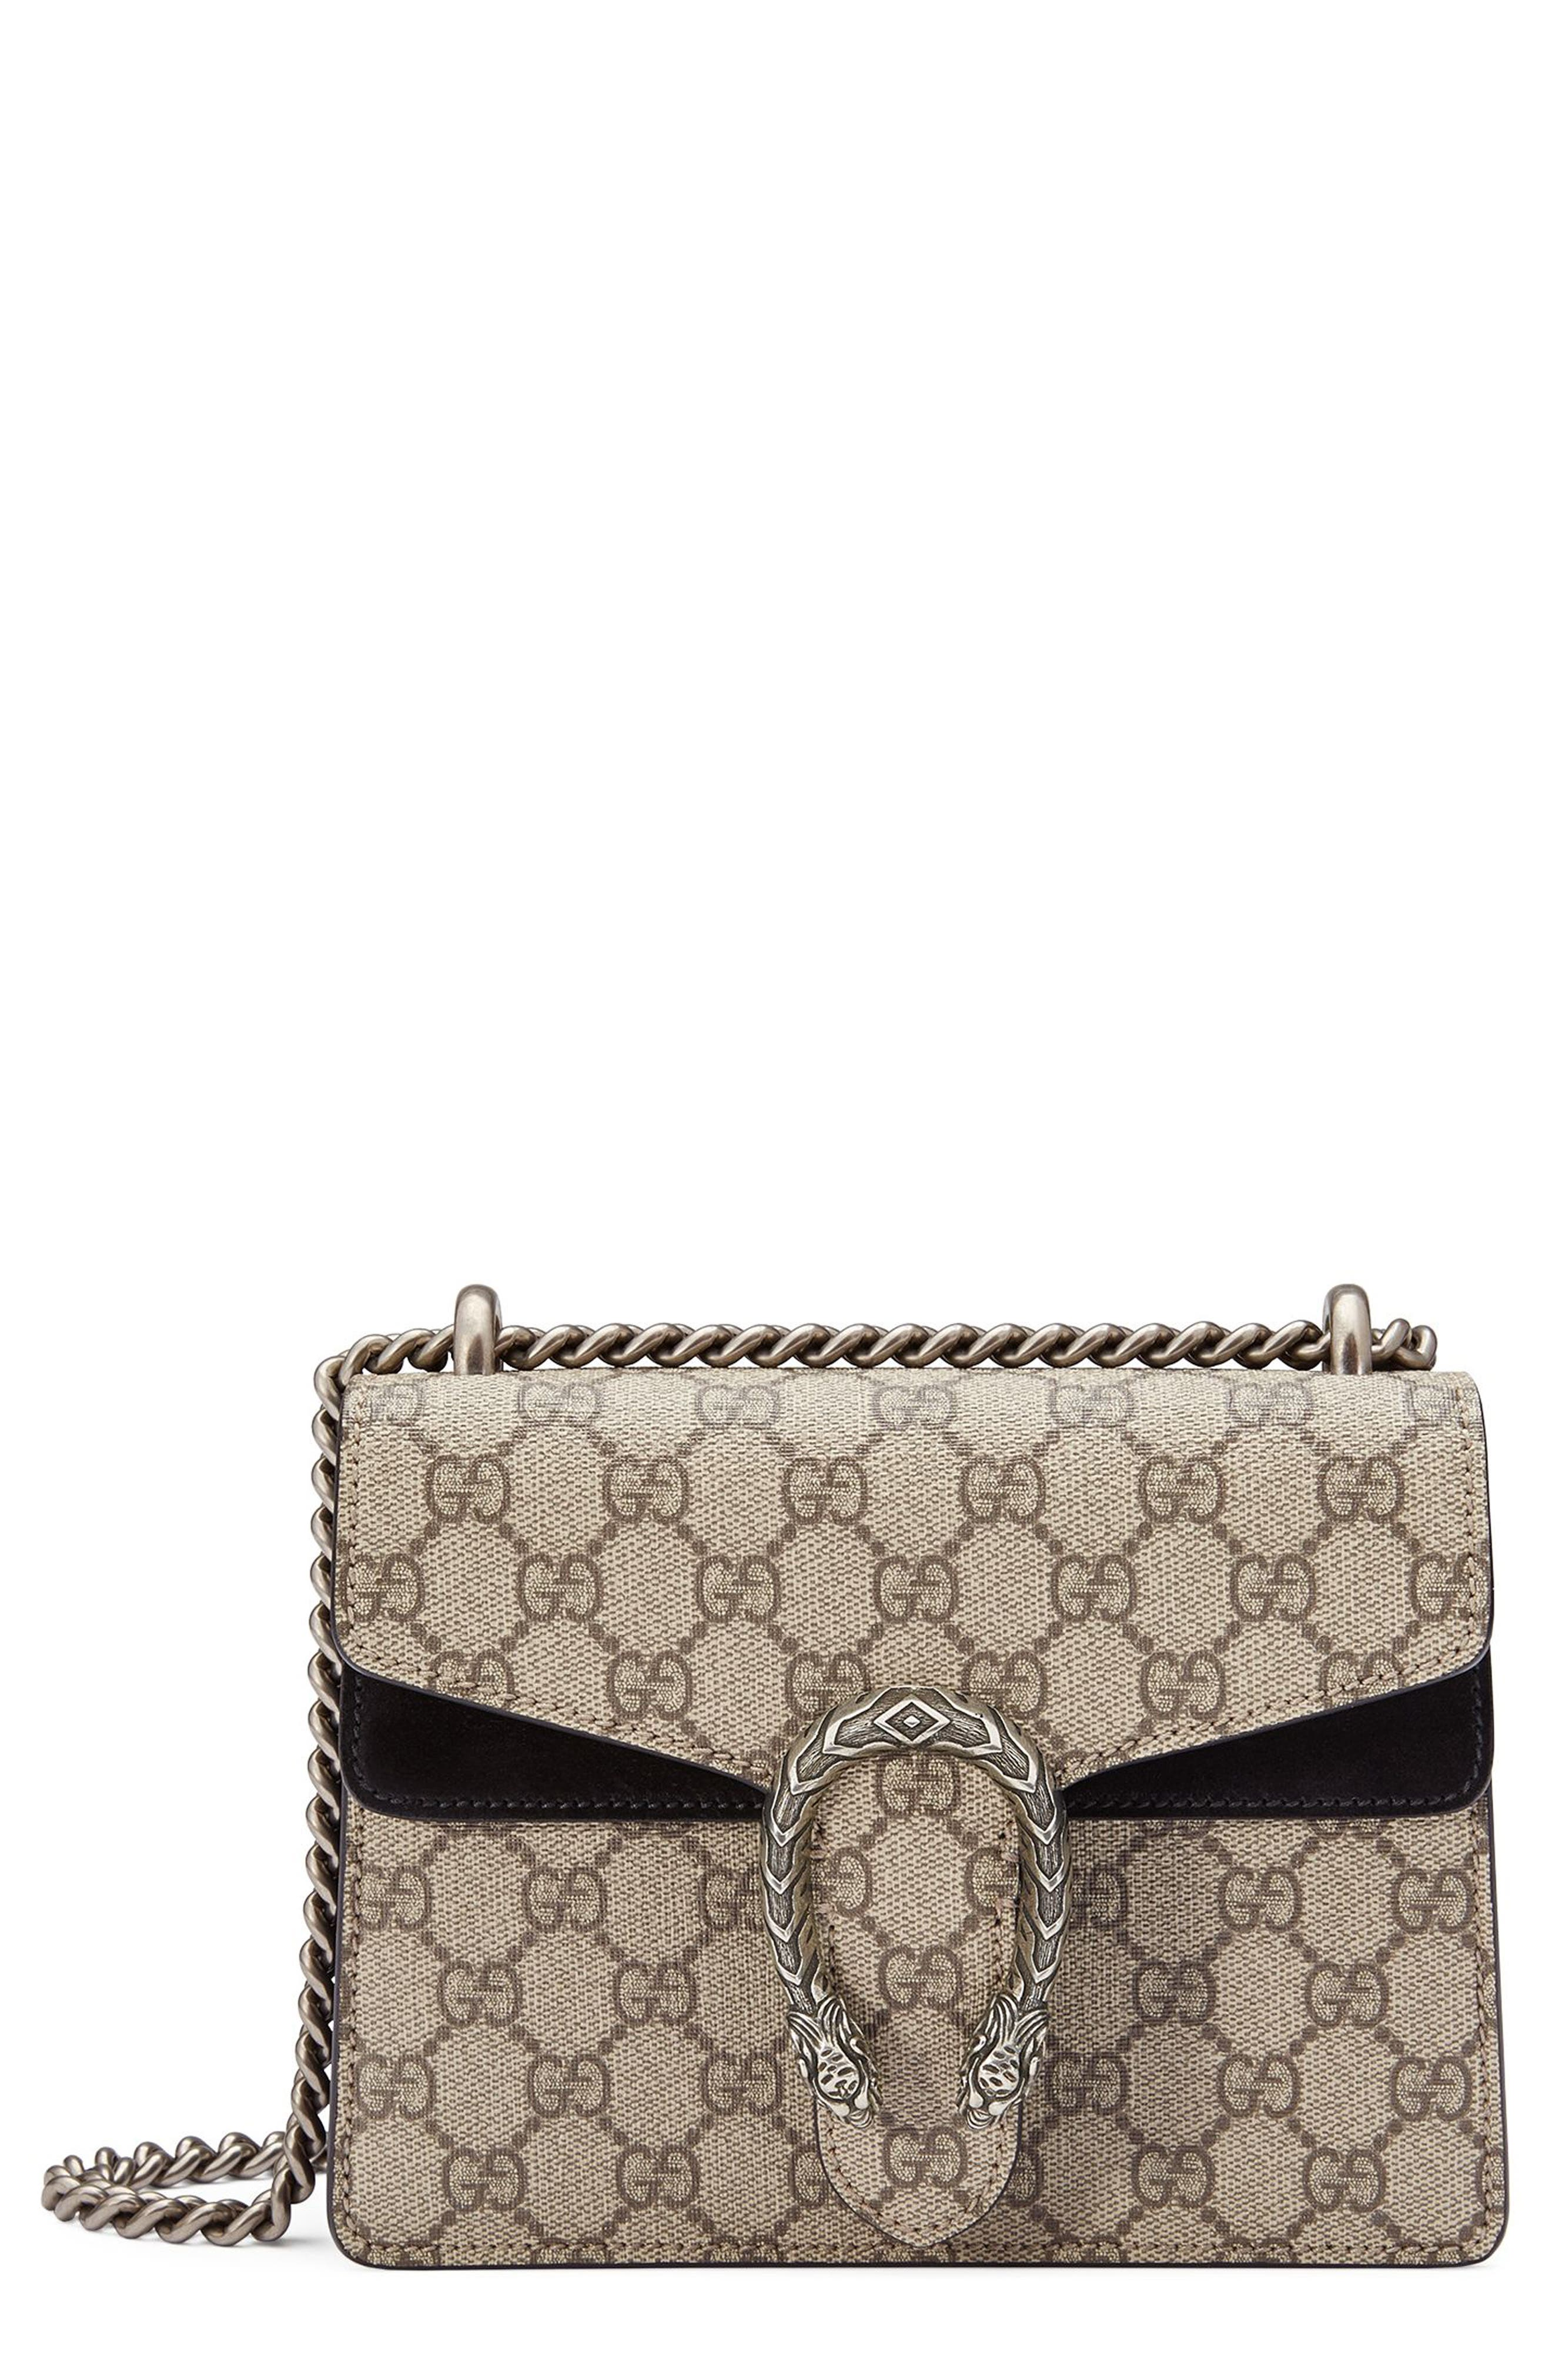 Alternate Image 1 Selected - Gucci Mini Dionysus GG Supreme Shoulder Bag